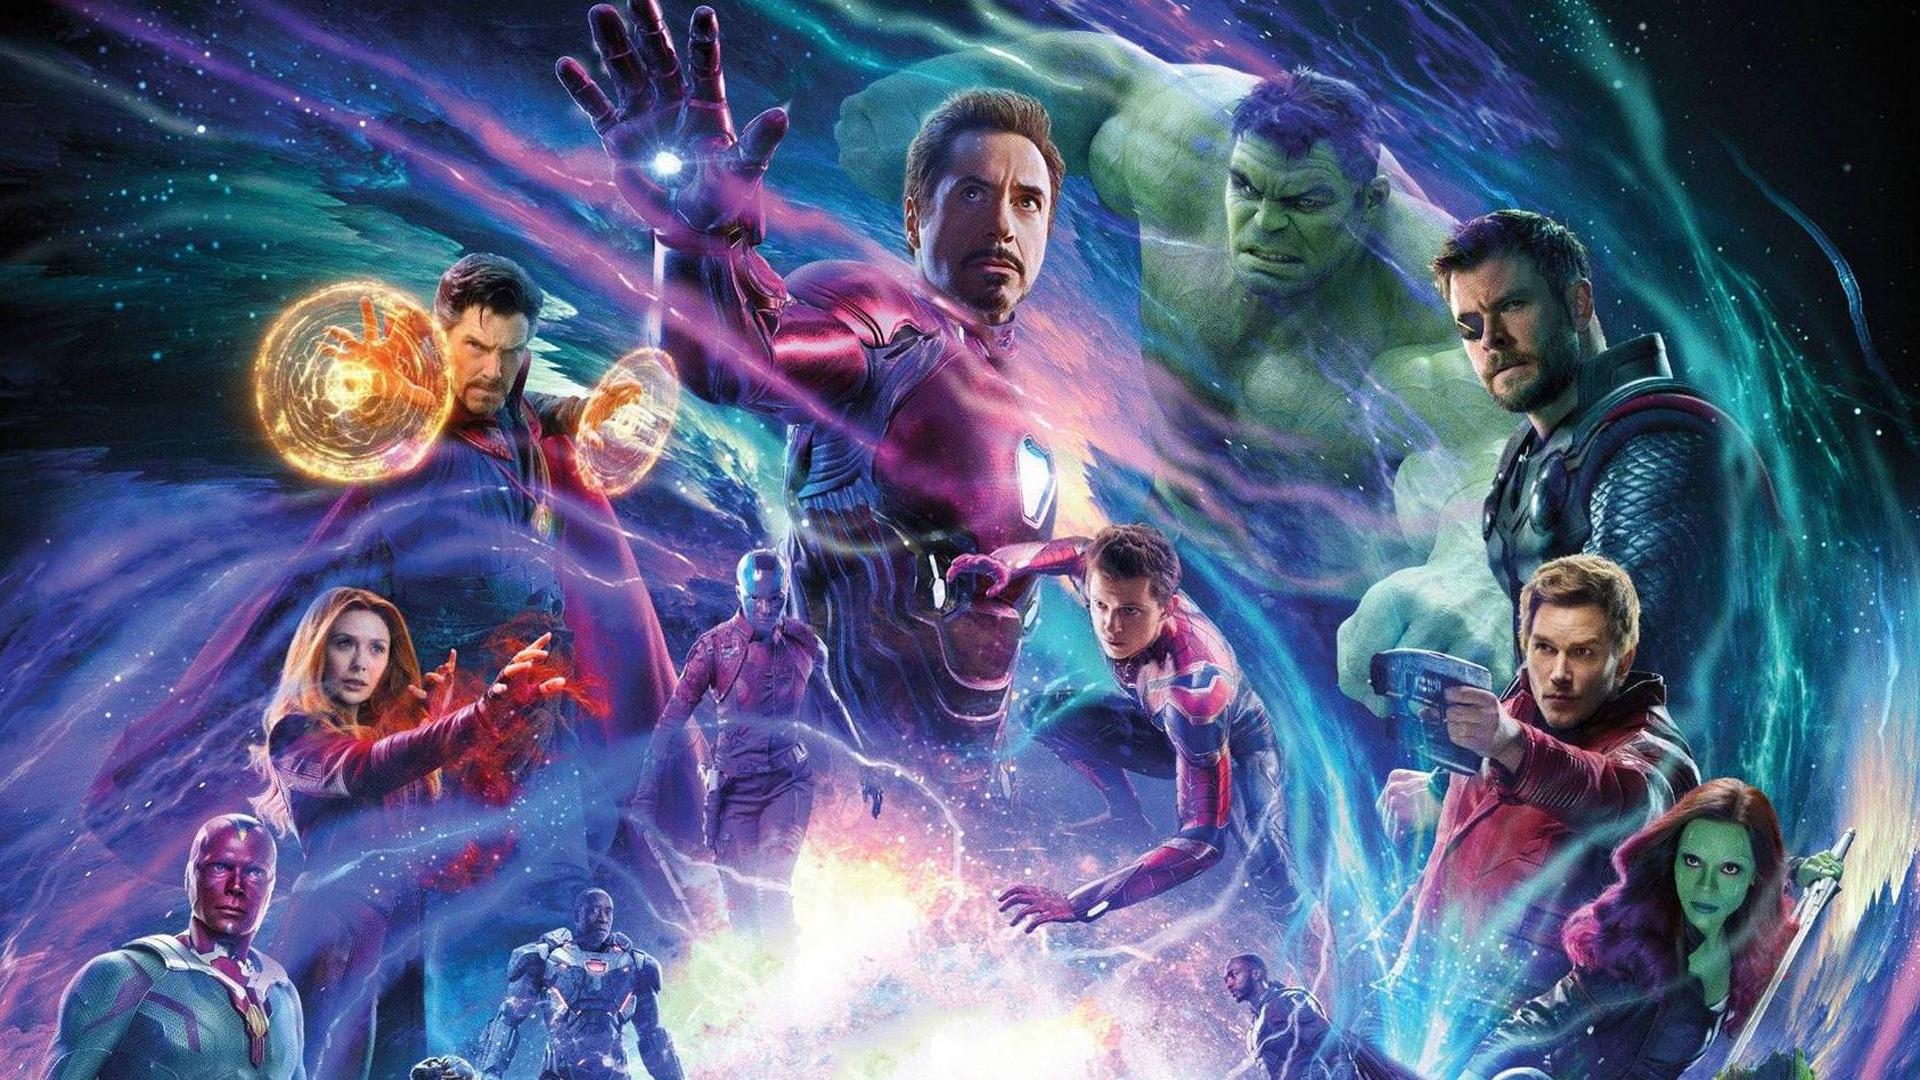 3d Thor Ragnarok Android Wallpaper Avengers Infinity War Movie Bill Poster Hd Movies 4k